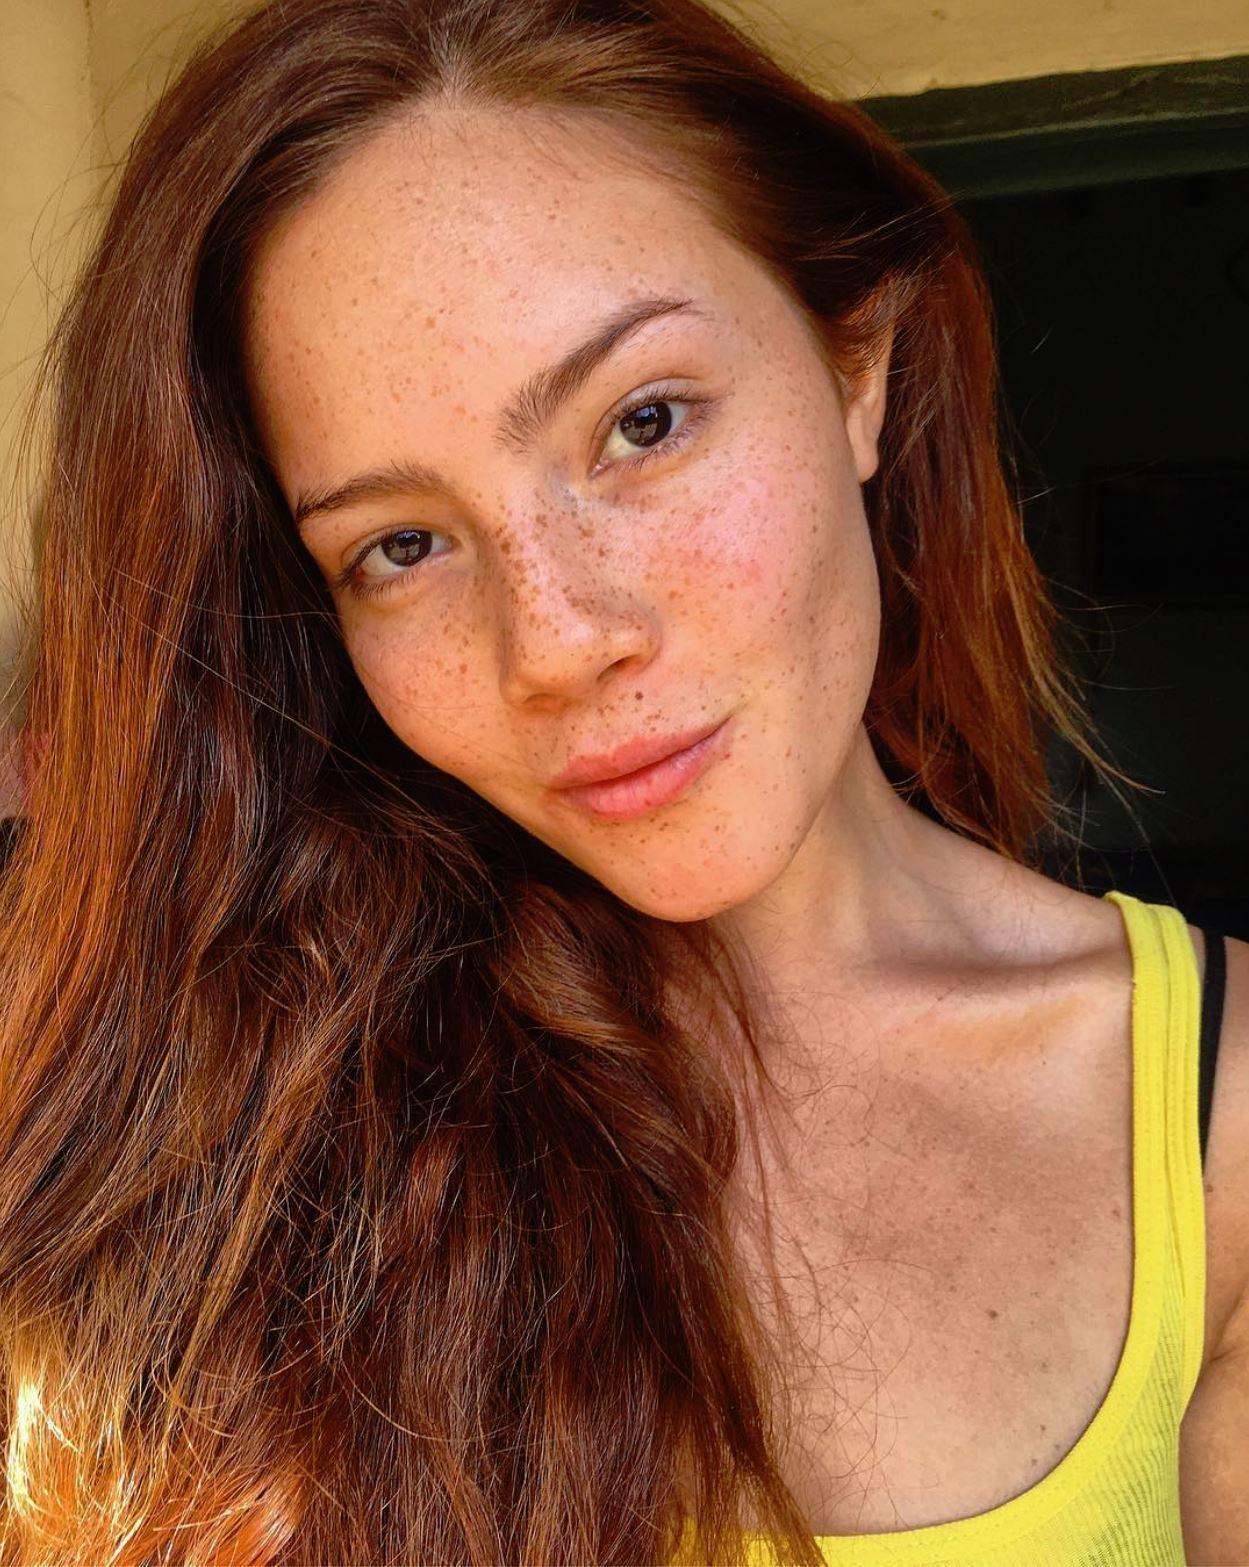 RT @Wetgirlslive: ��% �� Live Sex at �� https://t.co/bdYJ8Ny2Sv �� Yanisse Sanabria @Svix3 @PR0V8 @Drjohnson100 @SiliconEros https://t.co/8CD4X…